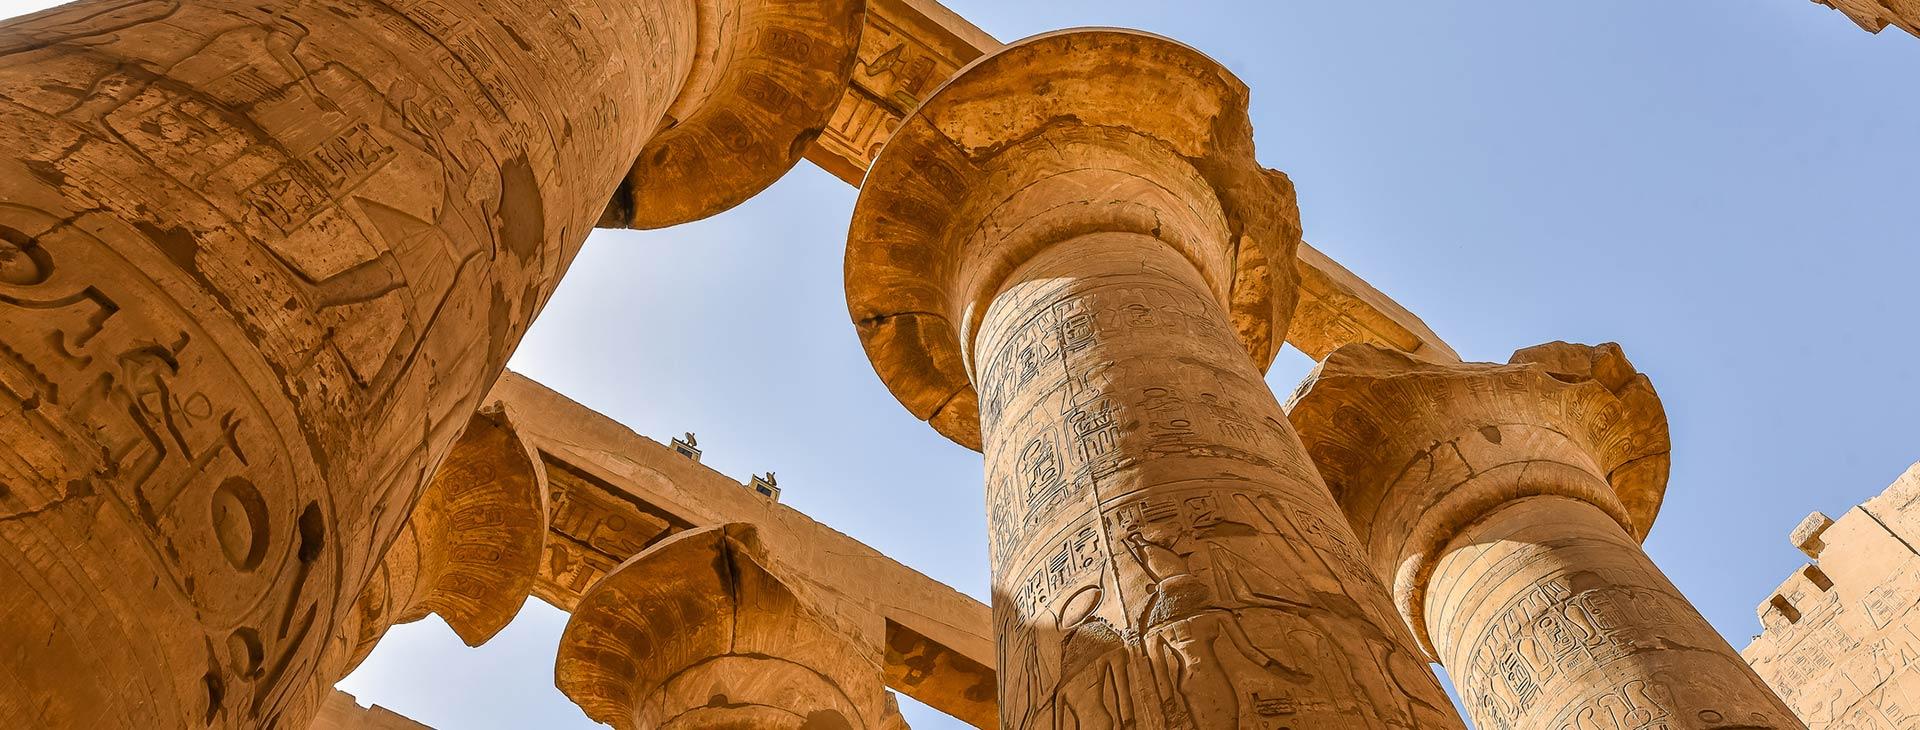 Egipt - Hurghada Holiday Tour Egipt, Wyc. objazdowe